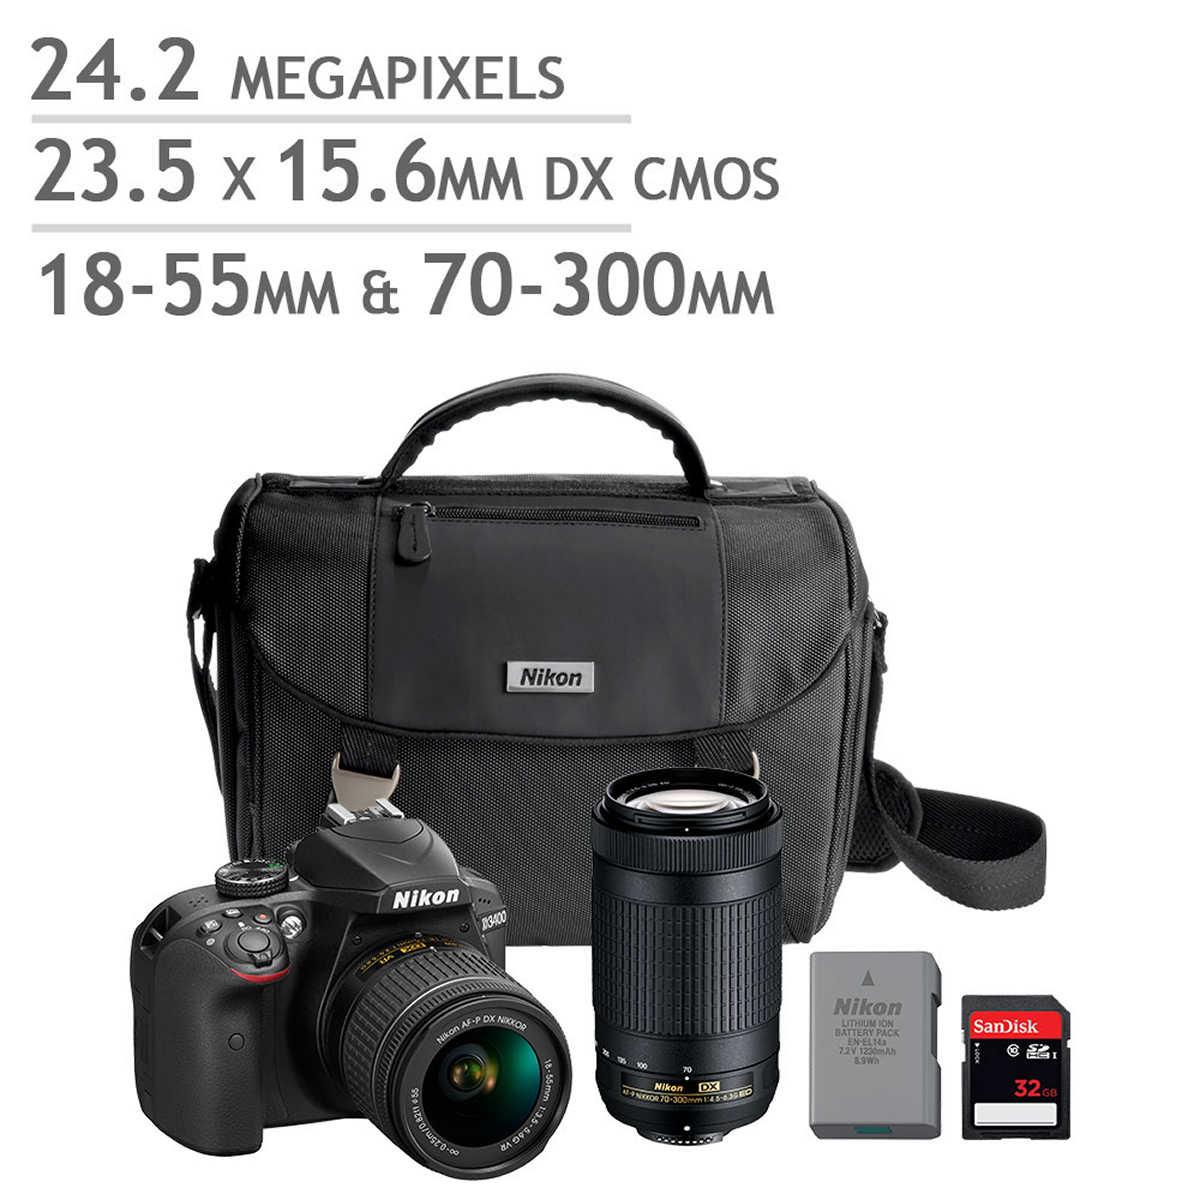 Camera Dslr Cameras Ebay digital slr cameras nikon d3400 dslr camera 2 lens bundle